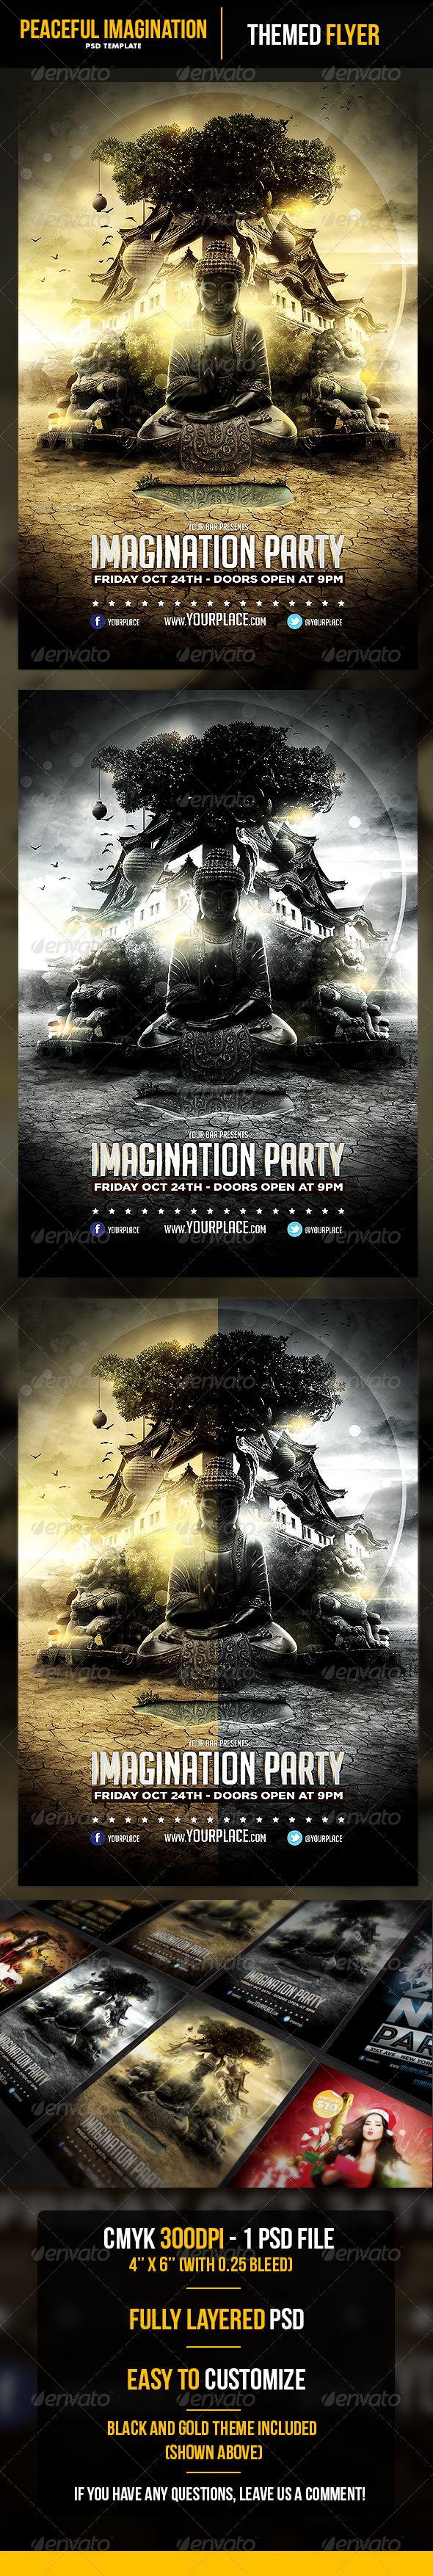 Peaceful Imagination Flyer Template - Flyers Print Templates